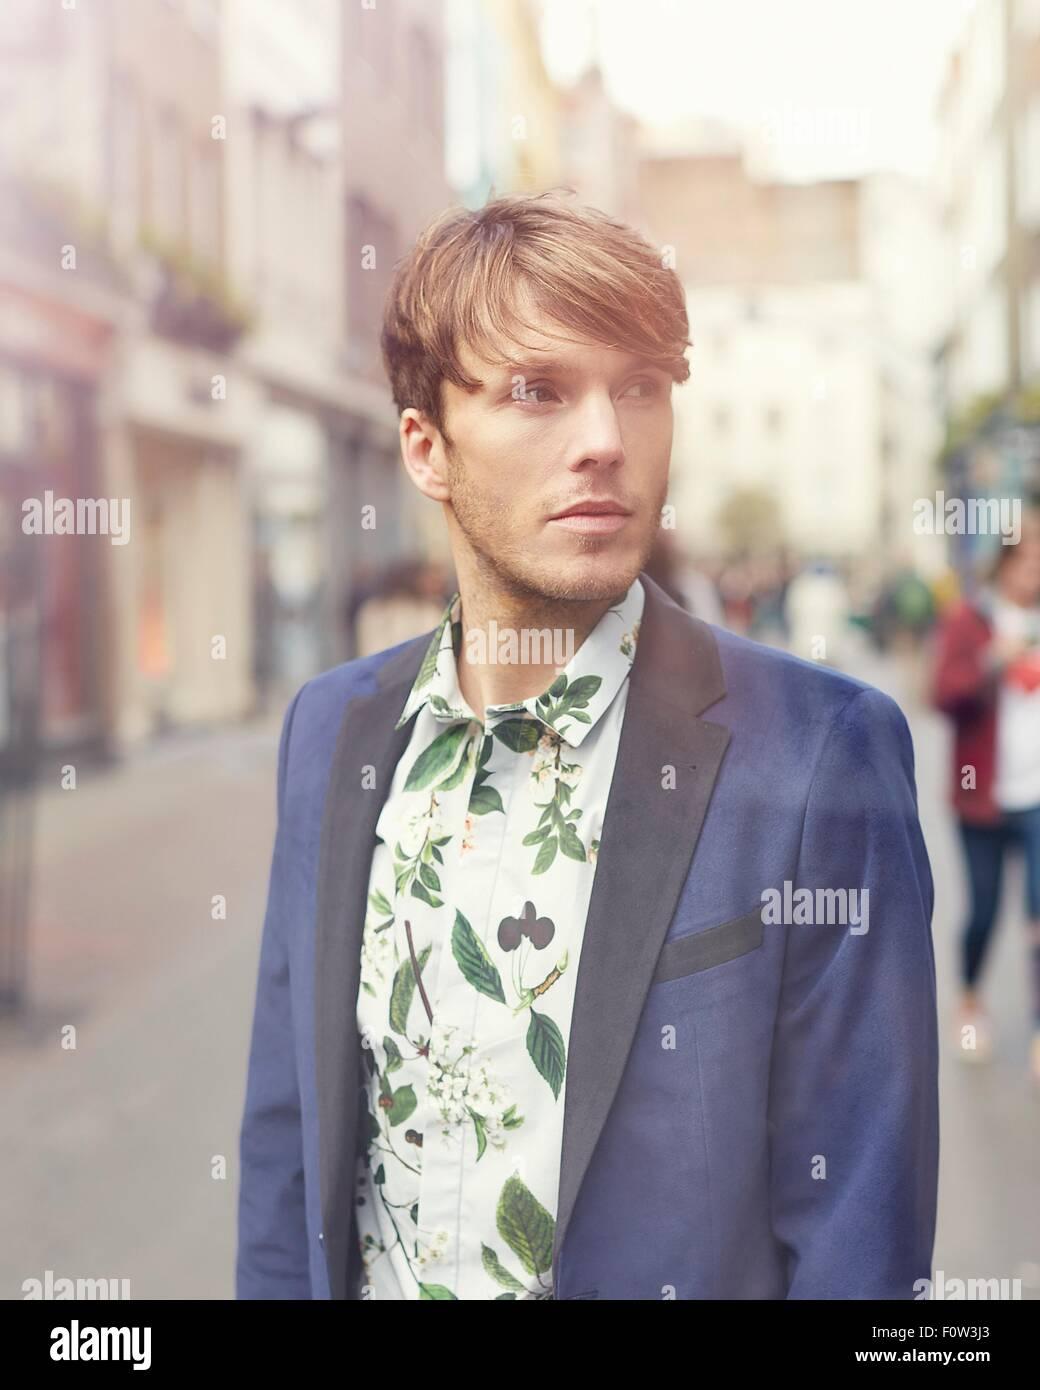 Portrait of stylish mid adult man on street, London, UK - Stock Image